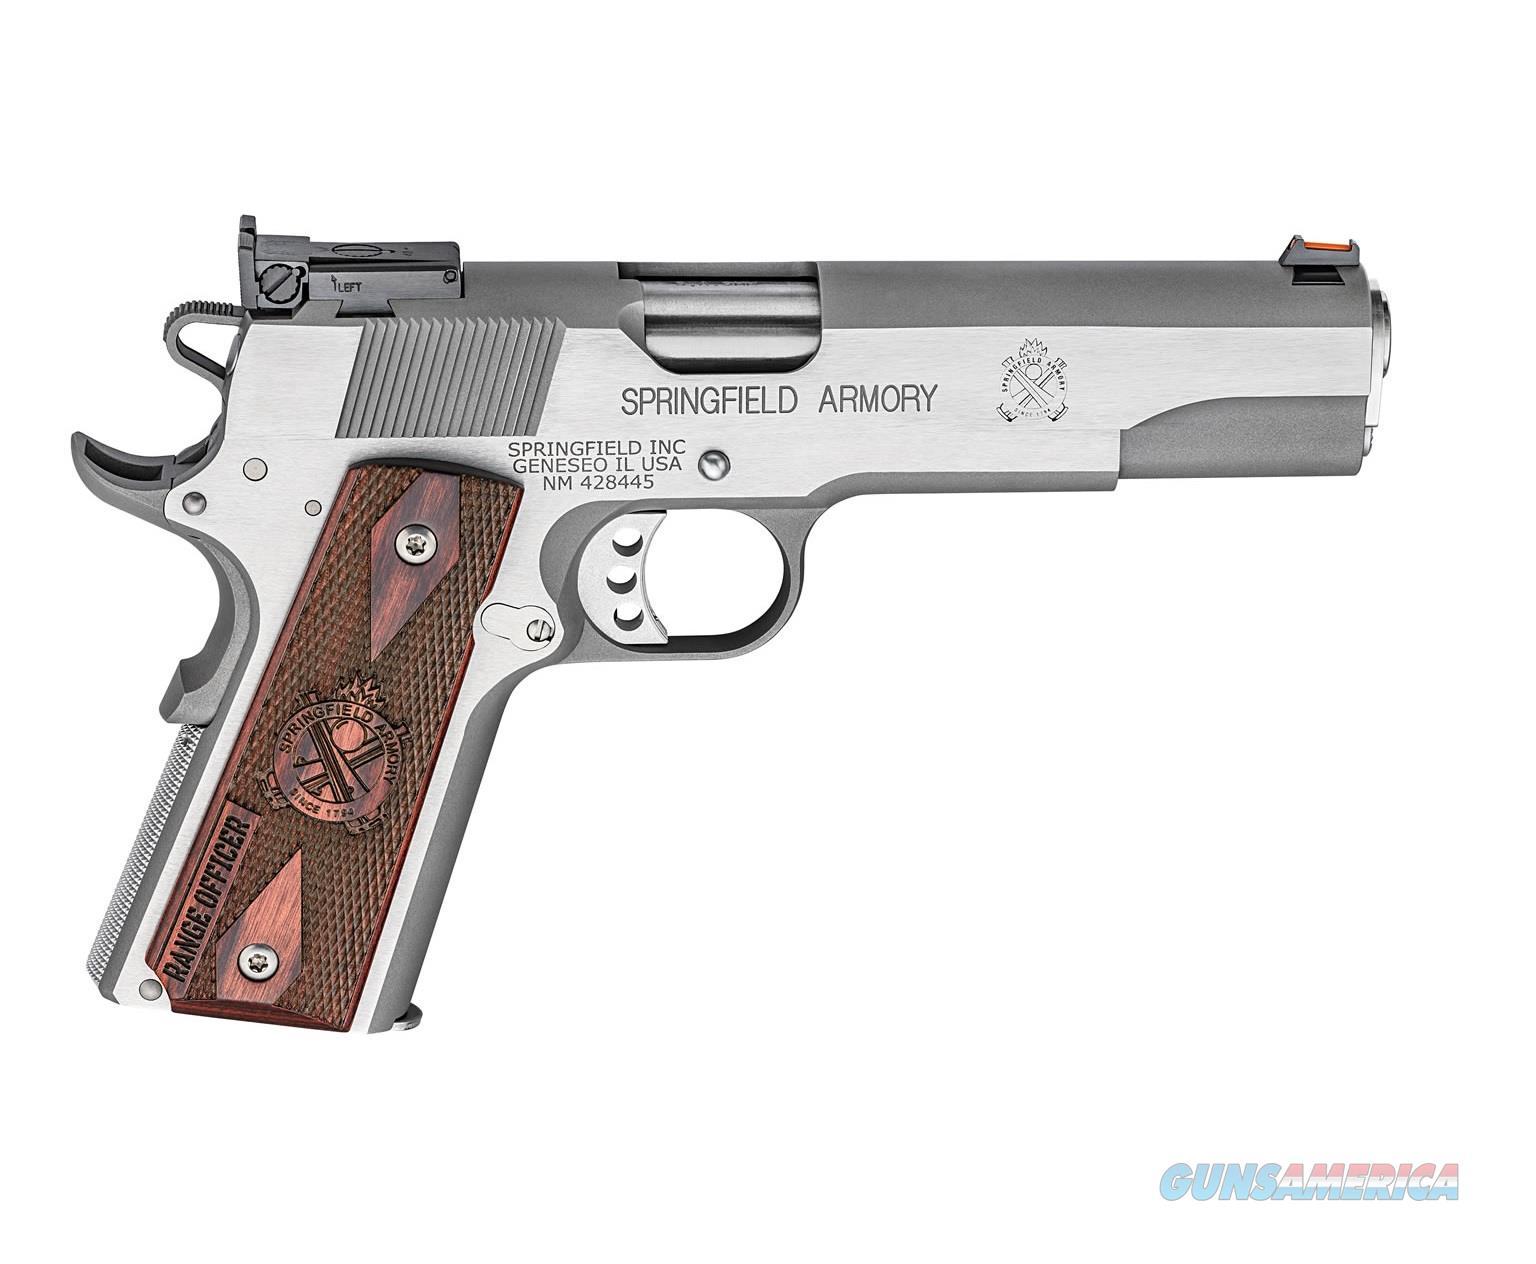 "Springfield 1911 Range Officer SS 9mm 5"" PI9122L   Guns > Pistols > Springfield Armory Pistols > 1911 Type"